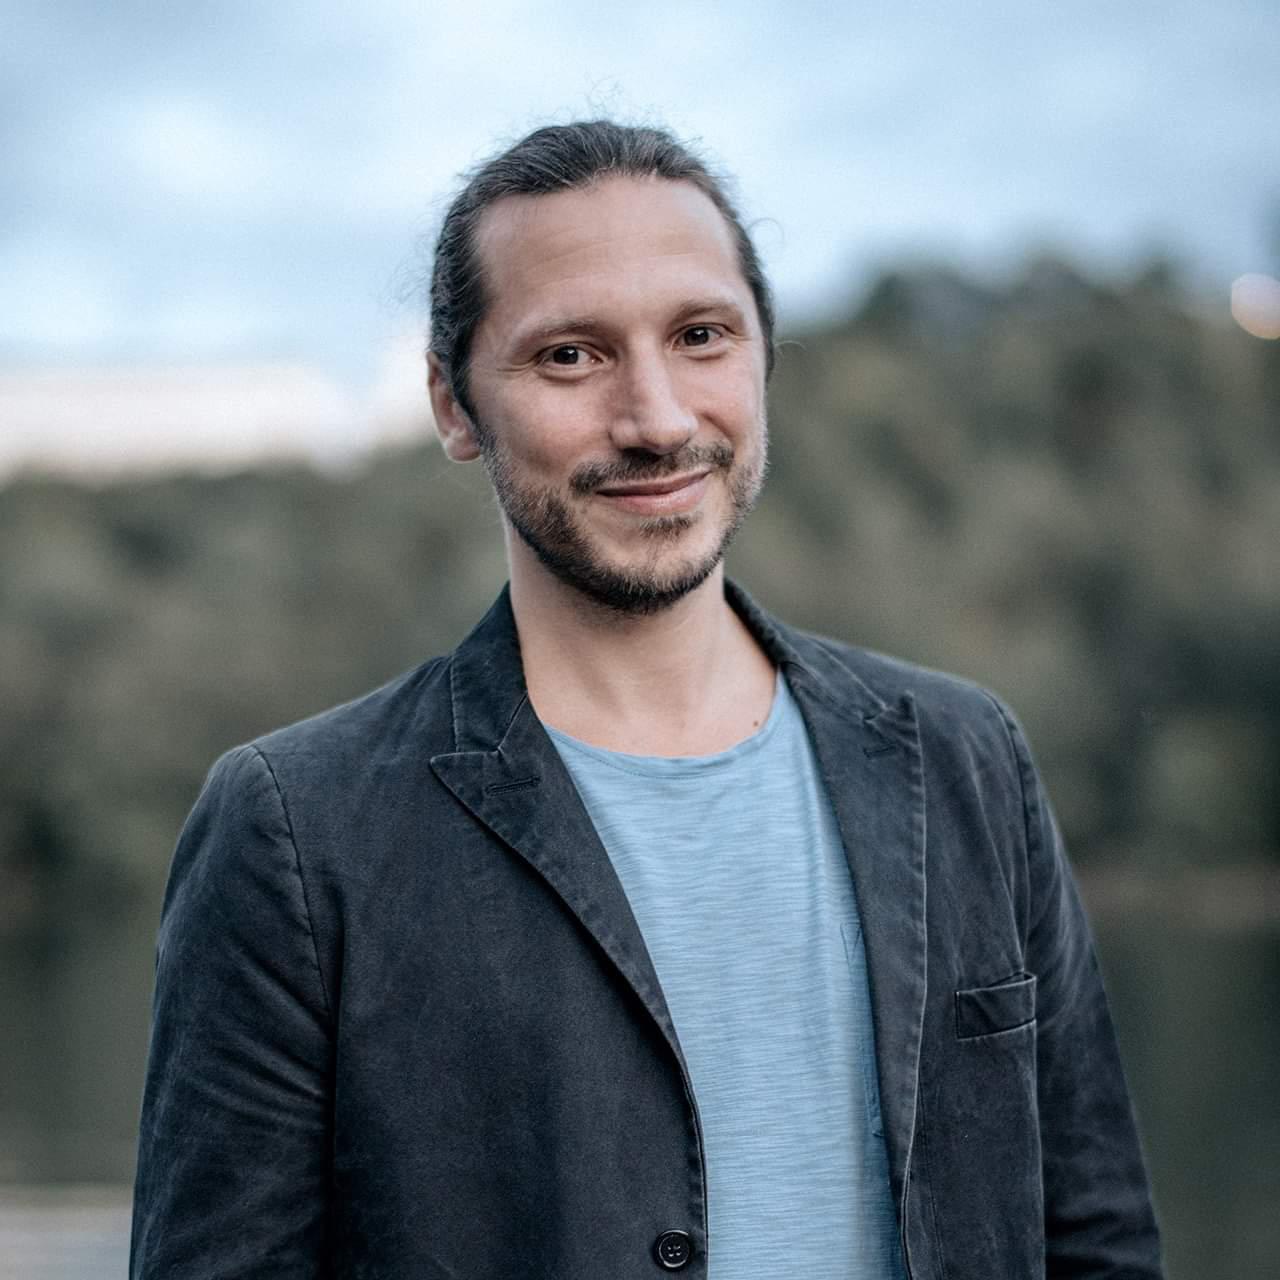 Johan Ericksson